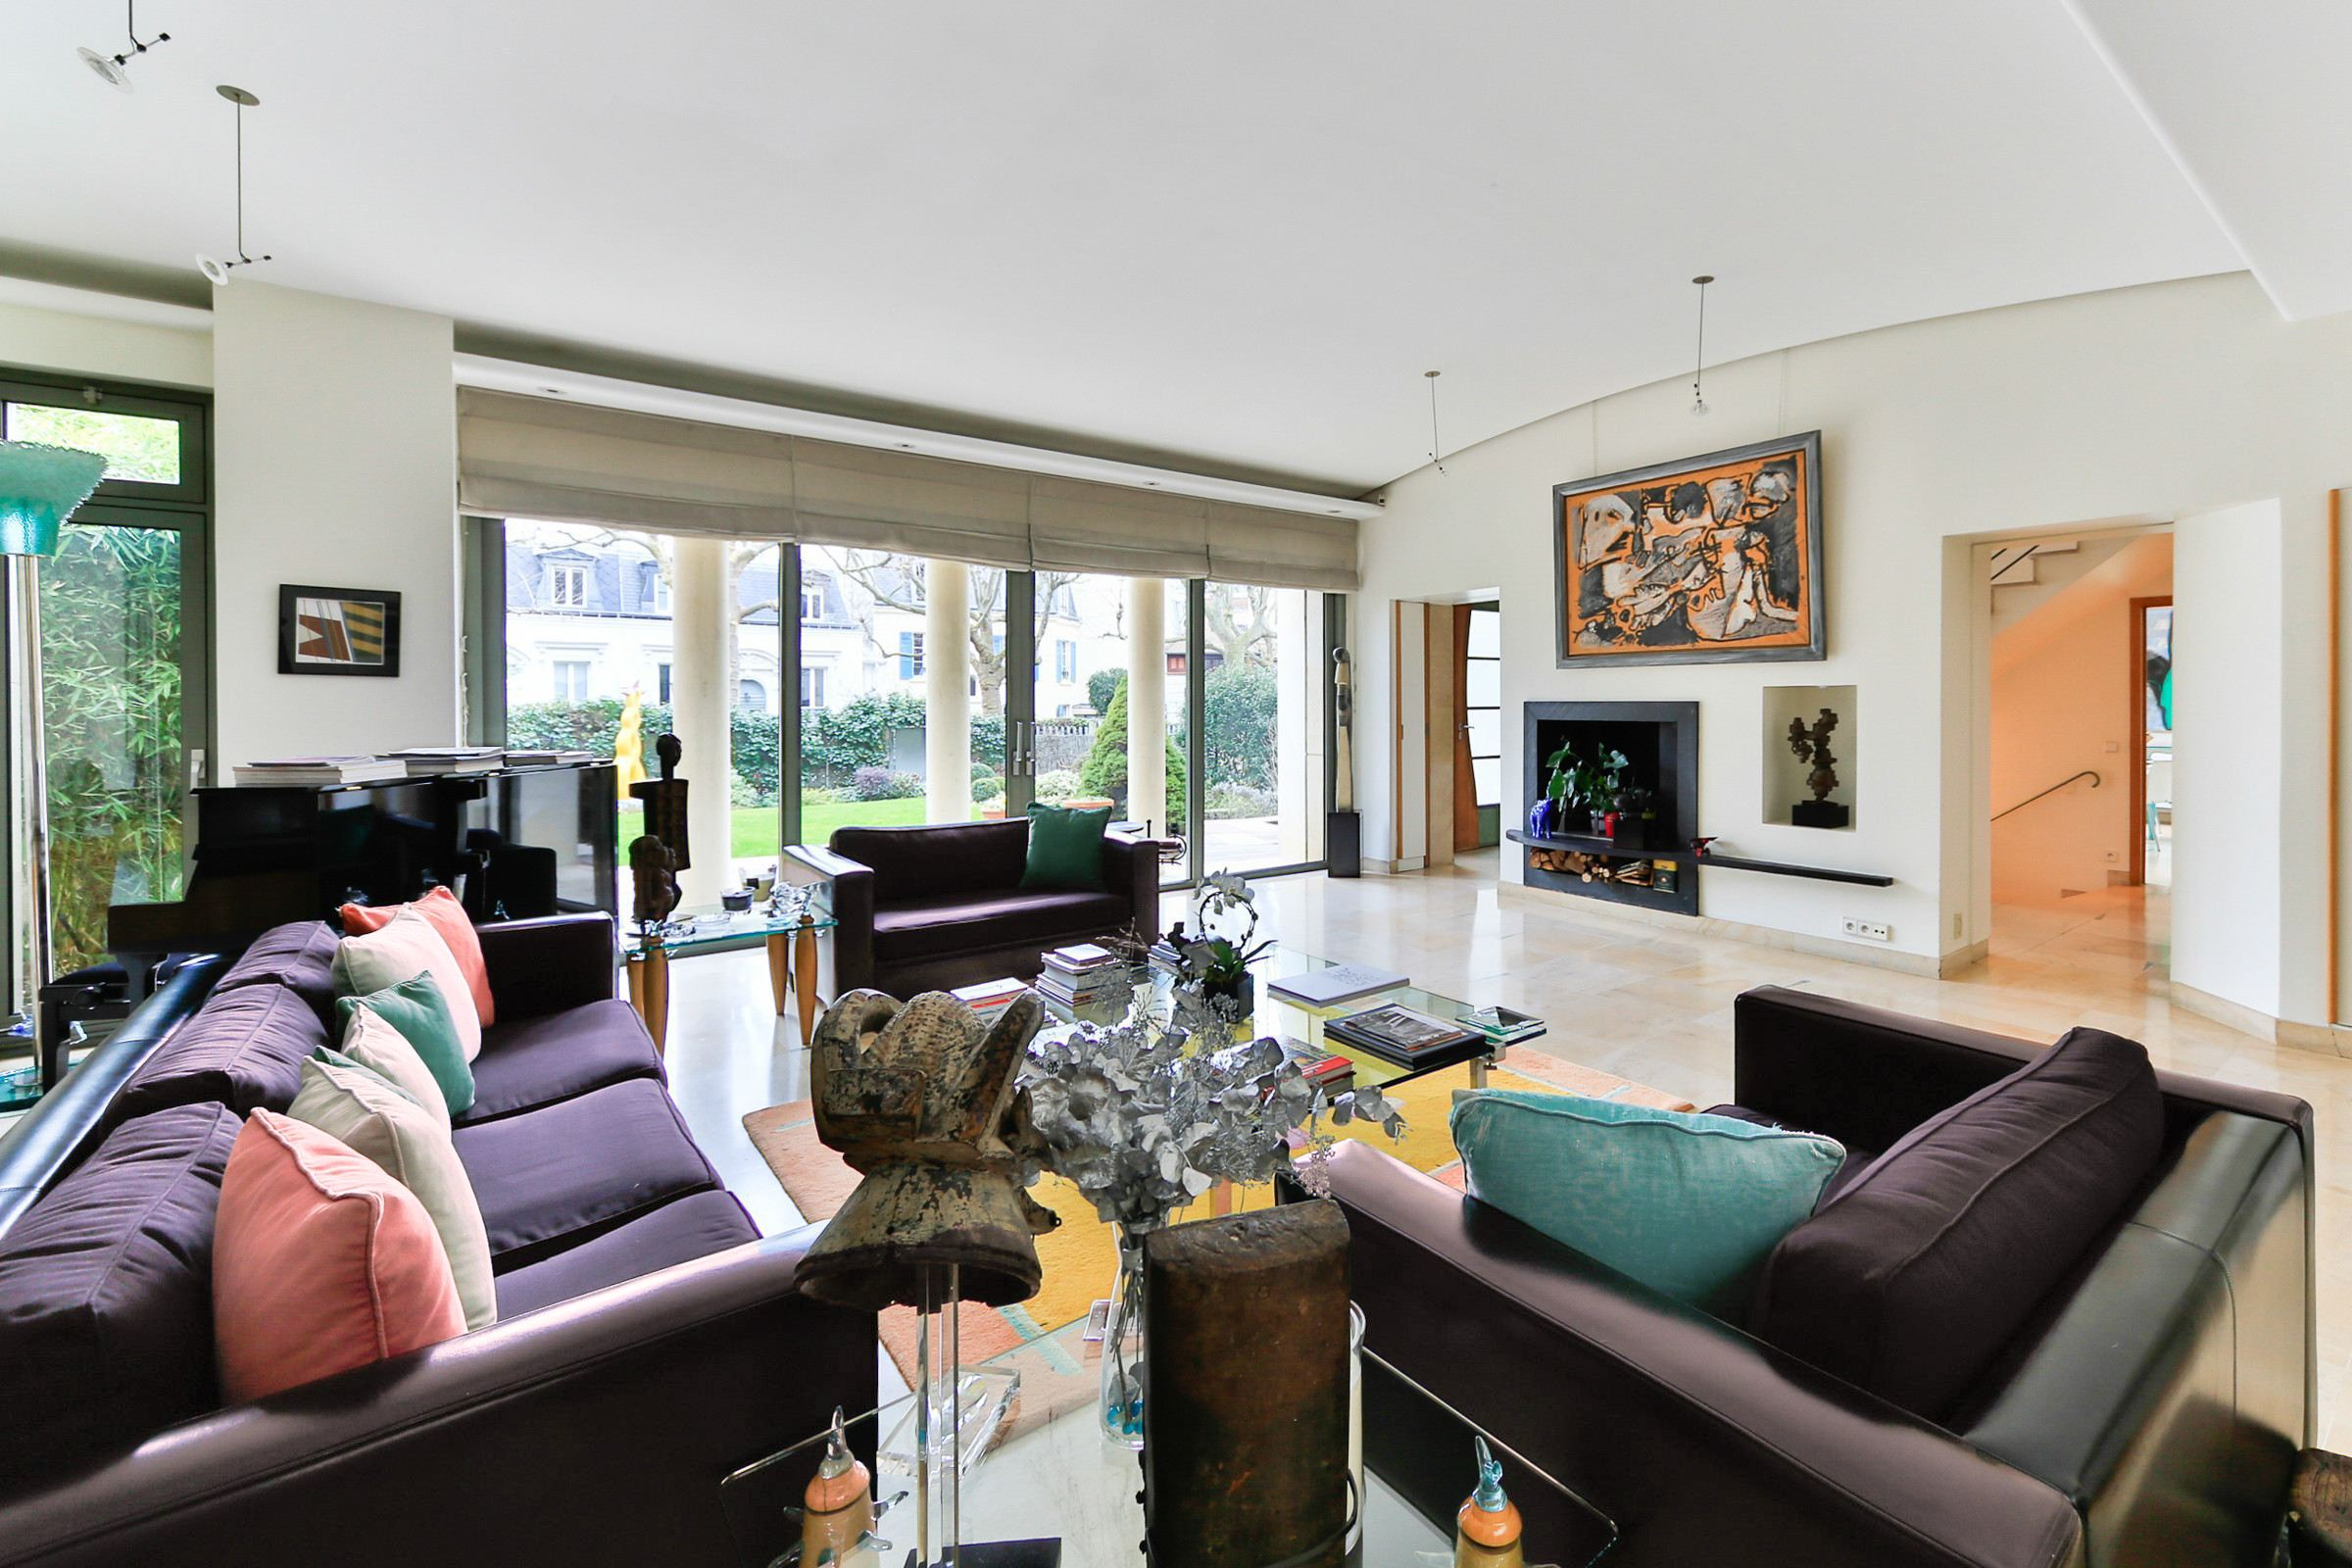 sales property at Paris 16 - Villa Montmorency. Private Mansion. Quiet environment.